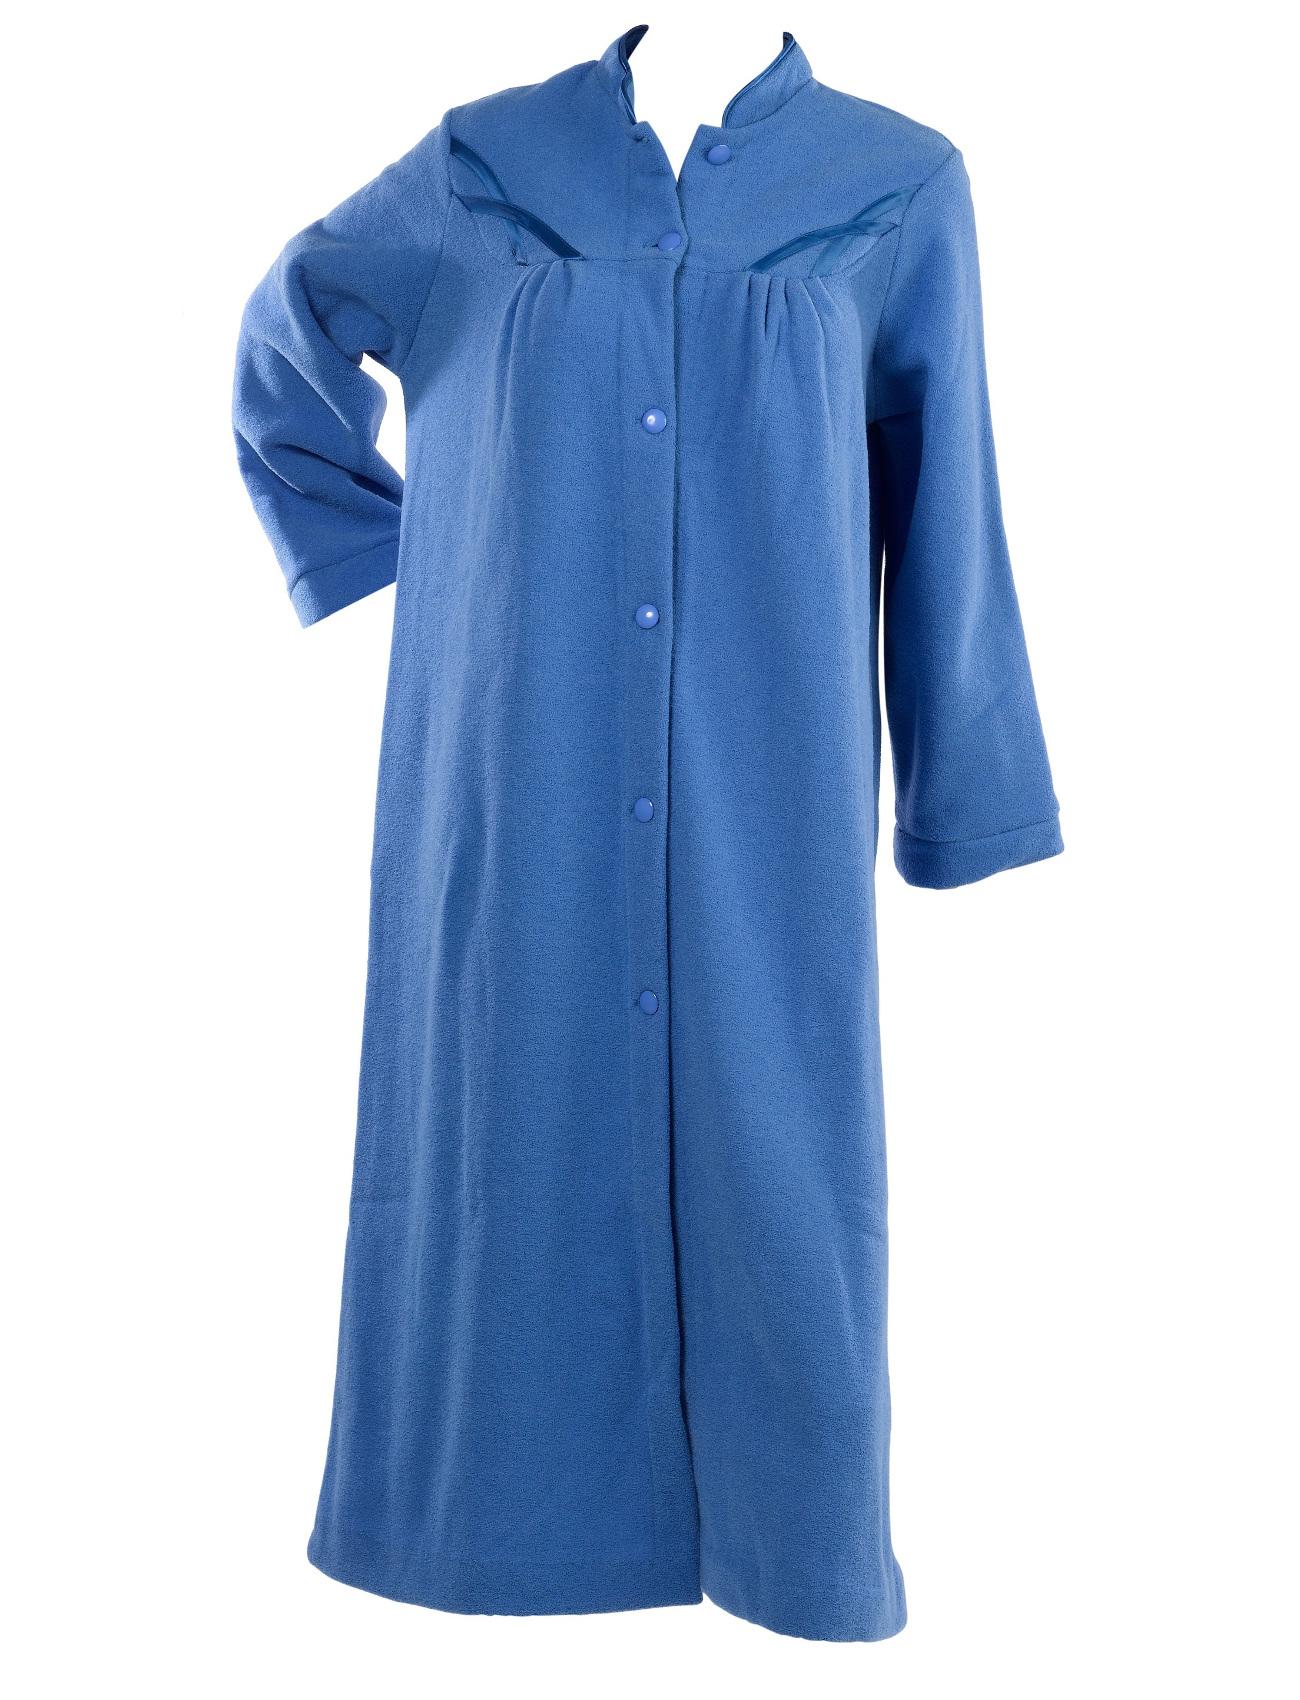 dressing gown womens soft polar fleece button up traditional nightwear bathrobe ebay. Black Bedroom Furniture Sets. Home Design Ideas